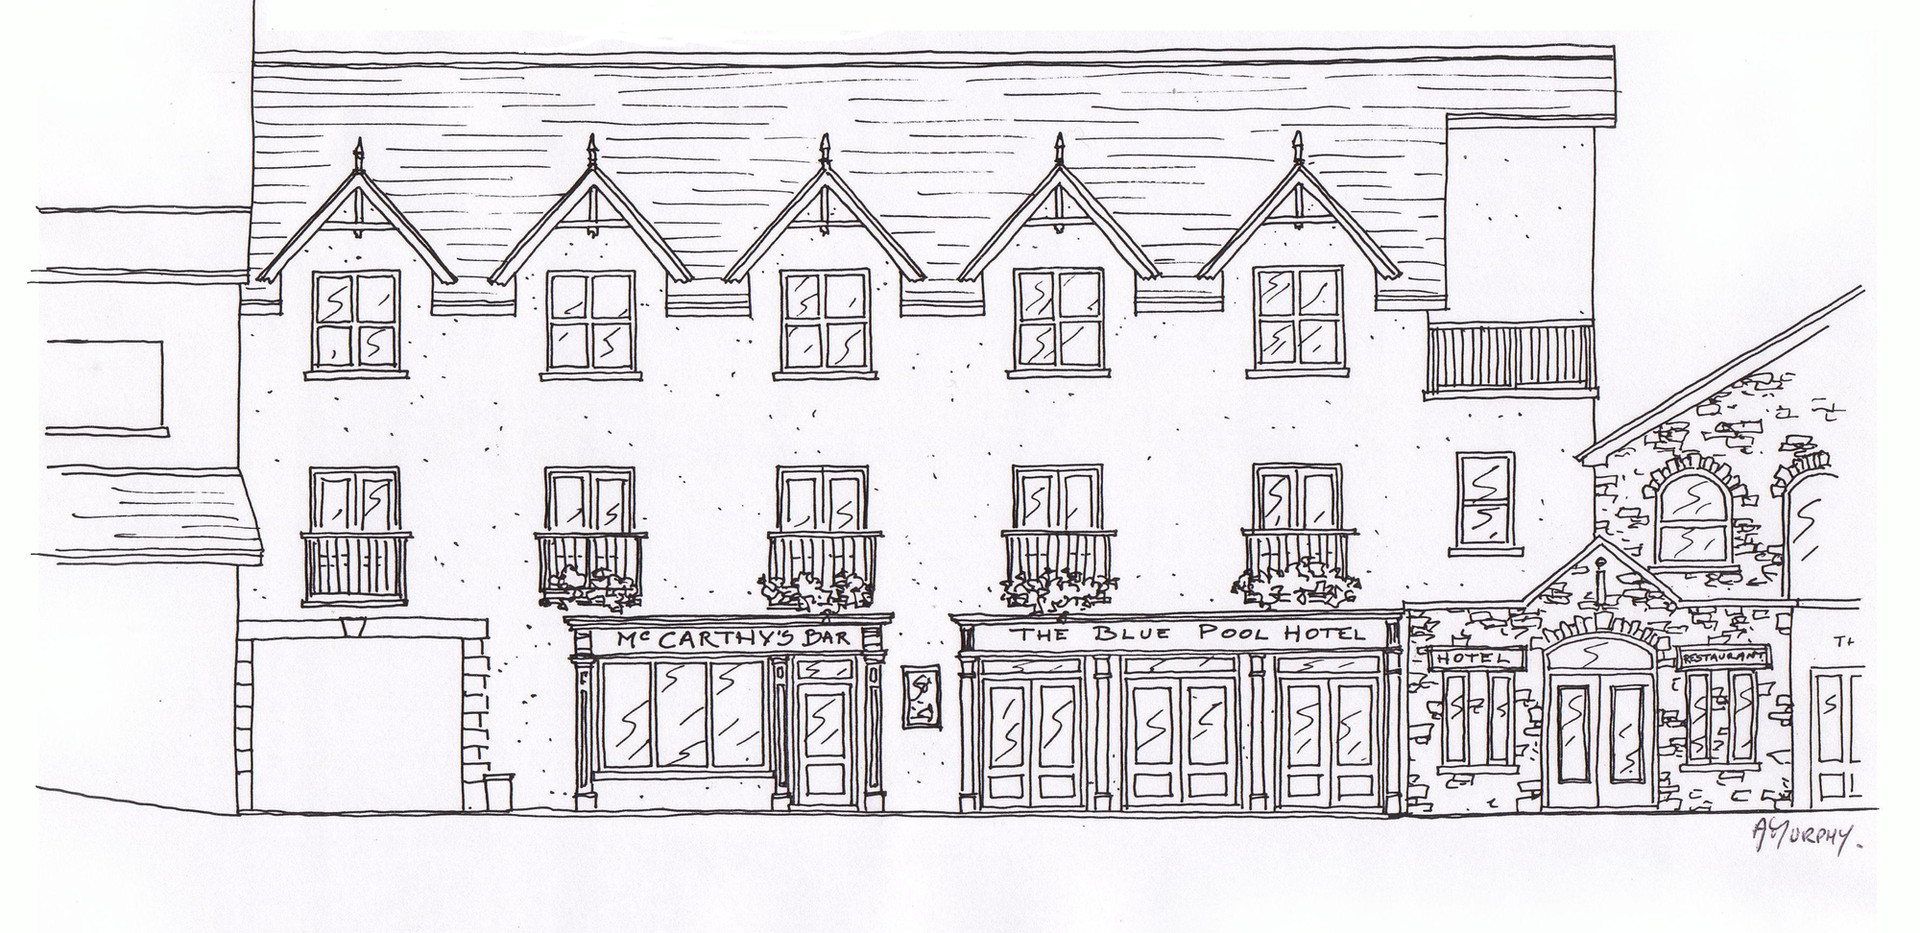 McCarthy's Bar, Glengarriff Park Hotel, Glengarriff, West Cork, Co. Cork, AM Design, Traditional Irish Pub Design & Fit Out, www.amdesign.ie @amdesignireland